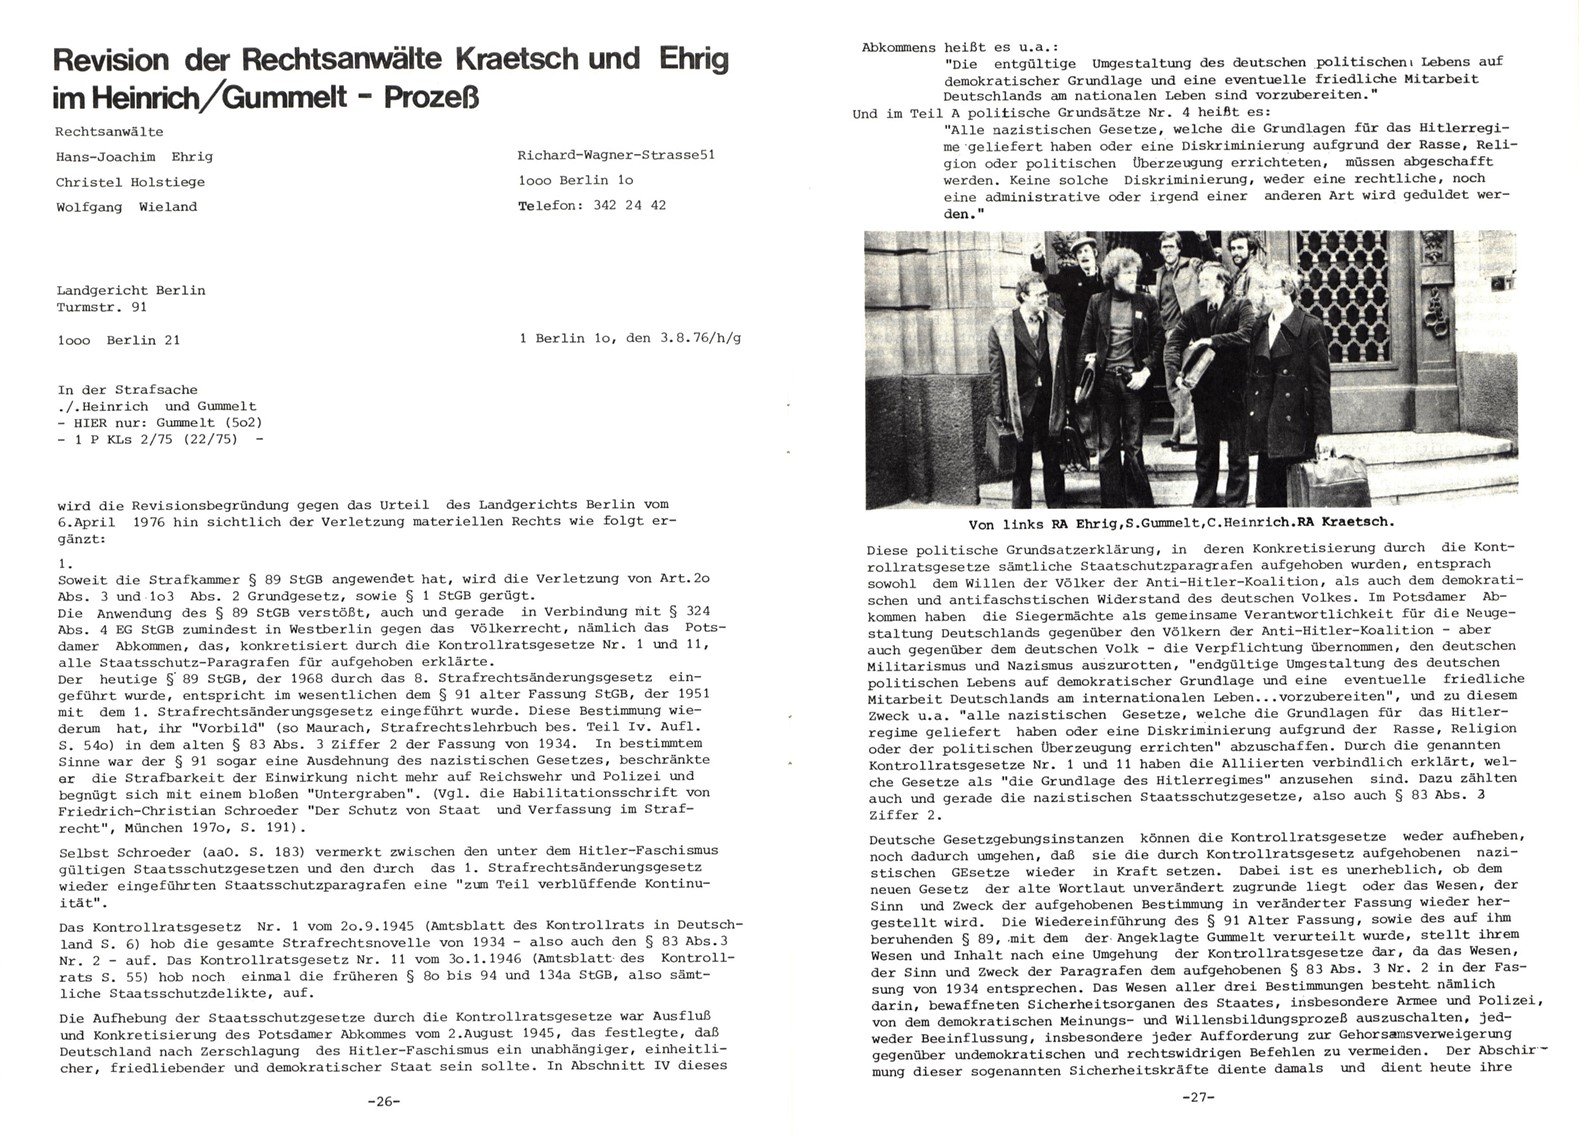 KPDAO_1976_Staatsschutzparagrafen_14